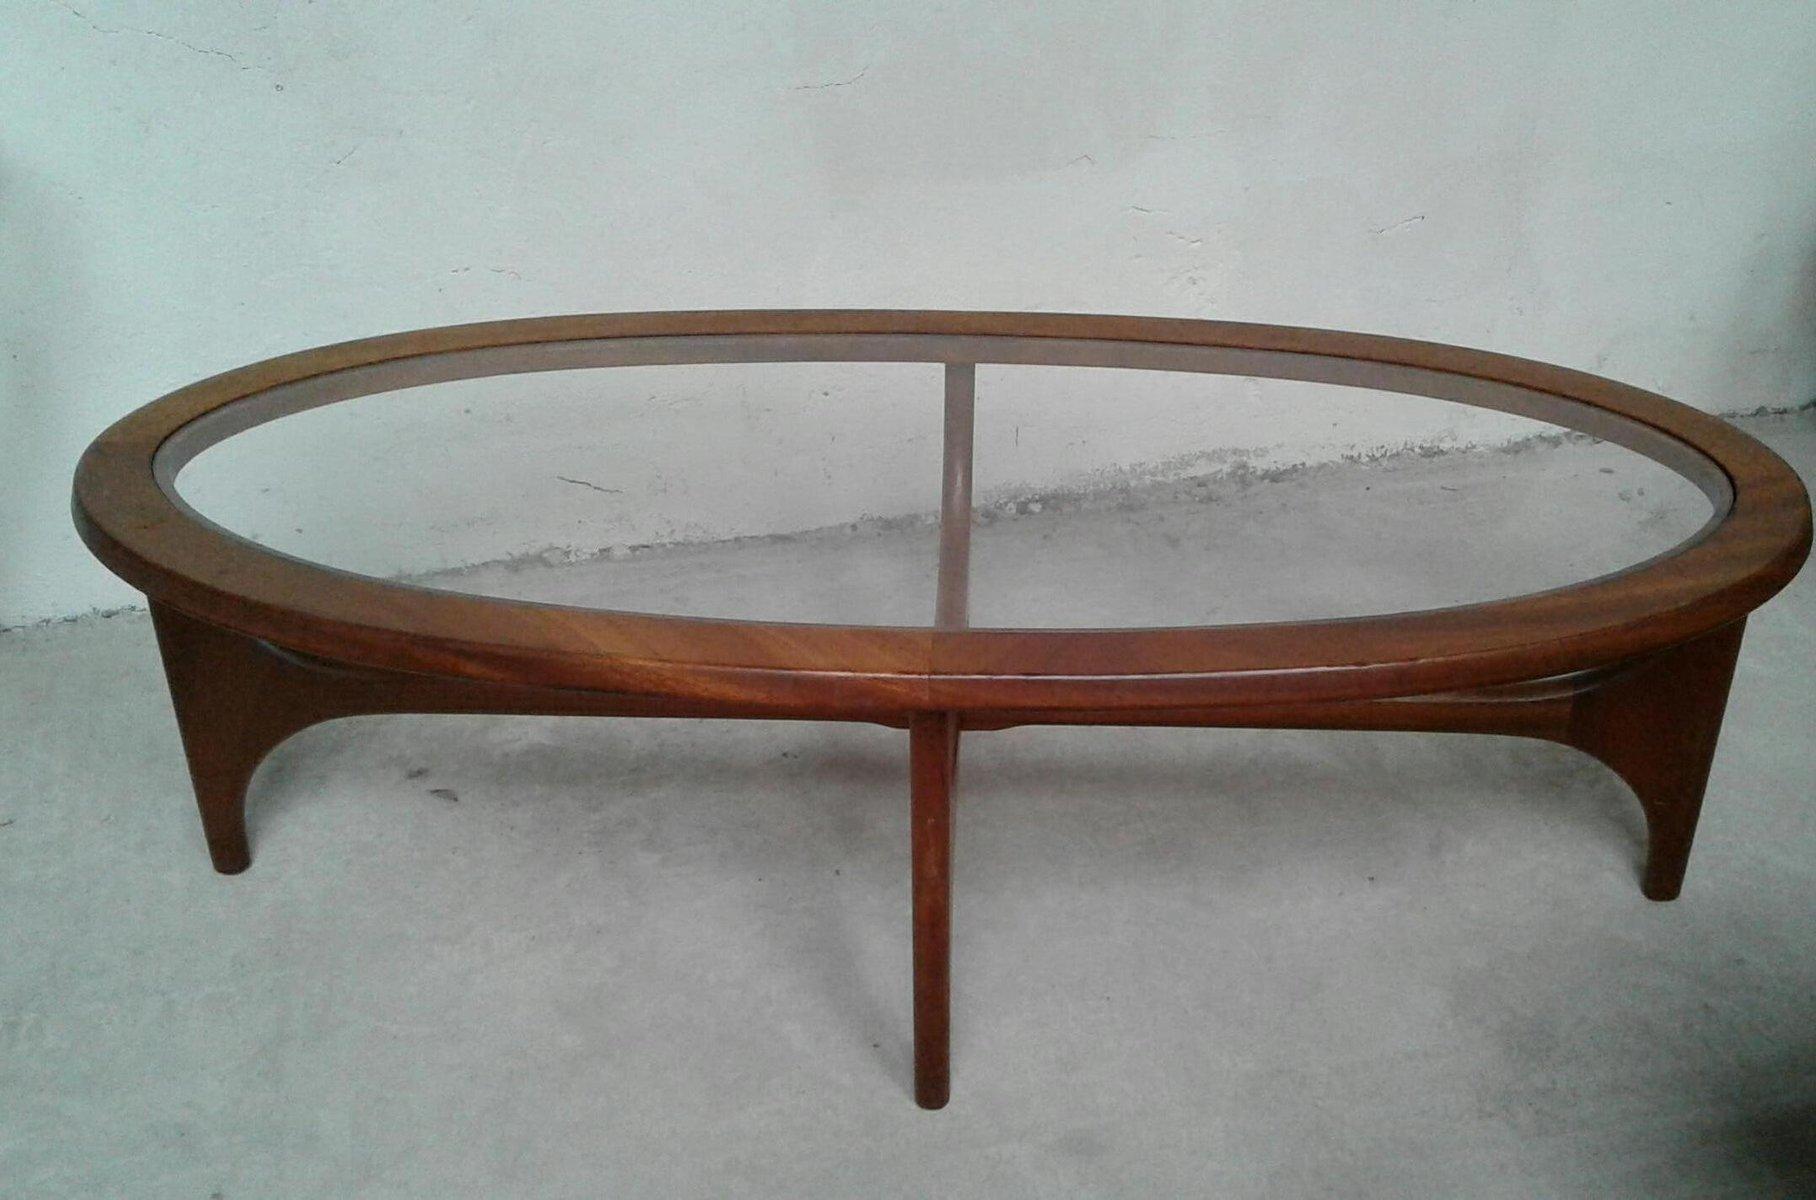 table basse vintage ovale en teck par stateroom pour stonehill 1960s en vente sur pamono. Black Bedroom Furniture Sets. Home Design Ideas